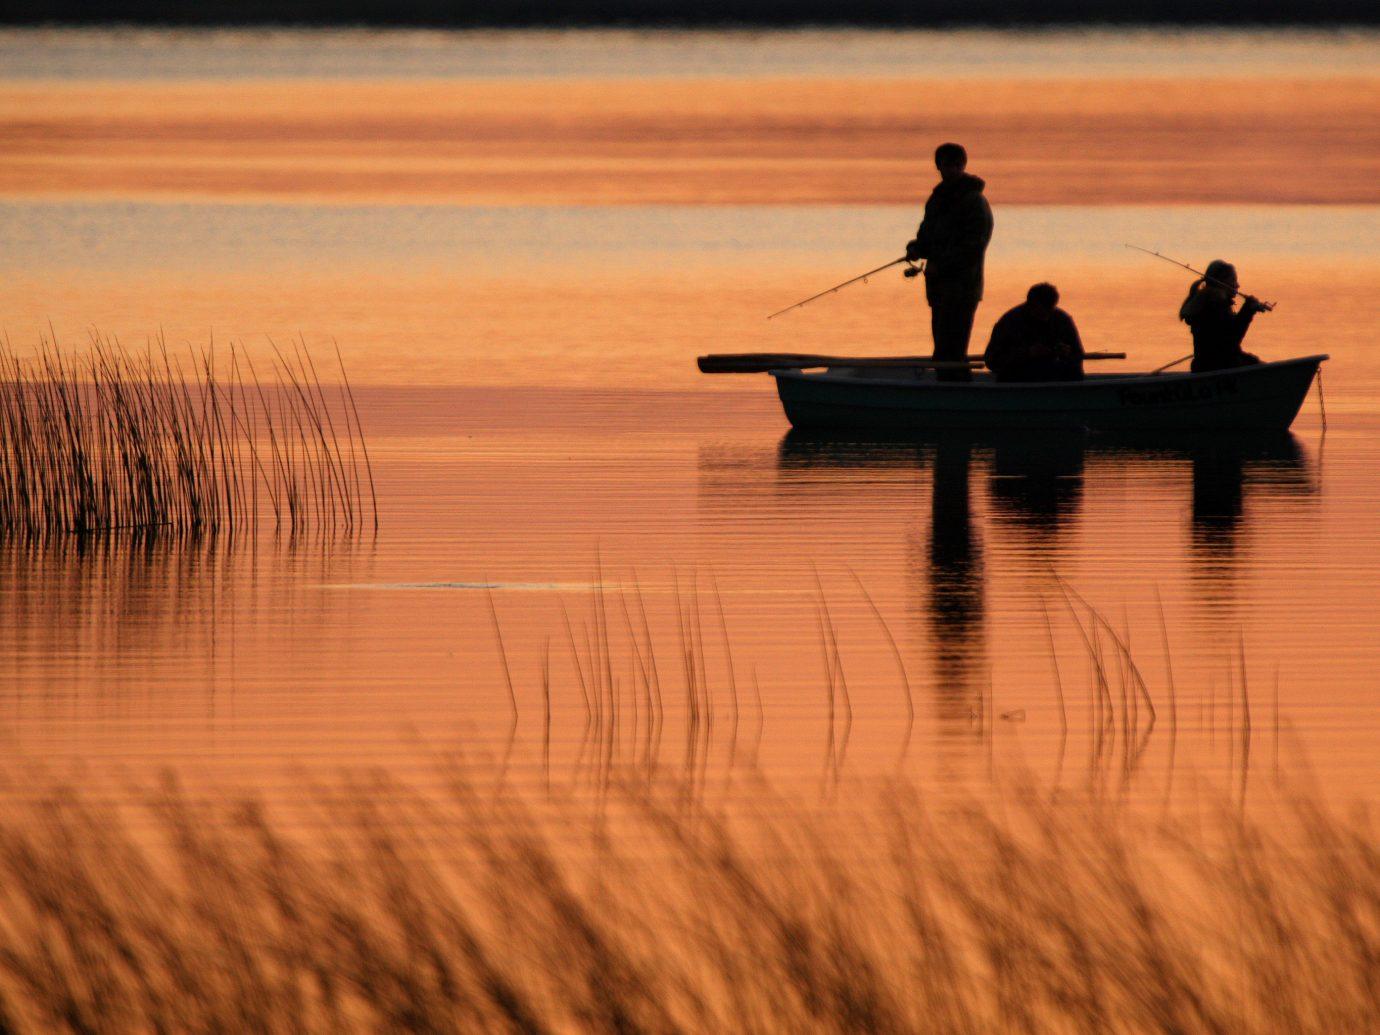 Offbeat outdoor water reflection Sunset atmospheric phenomenon horizon sunrise shore dawn morning Sea evening dusk sunlight Lake